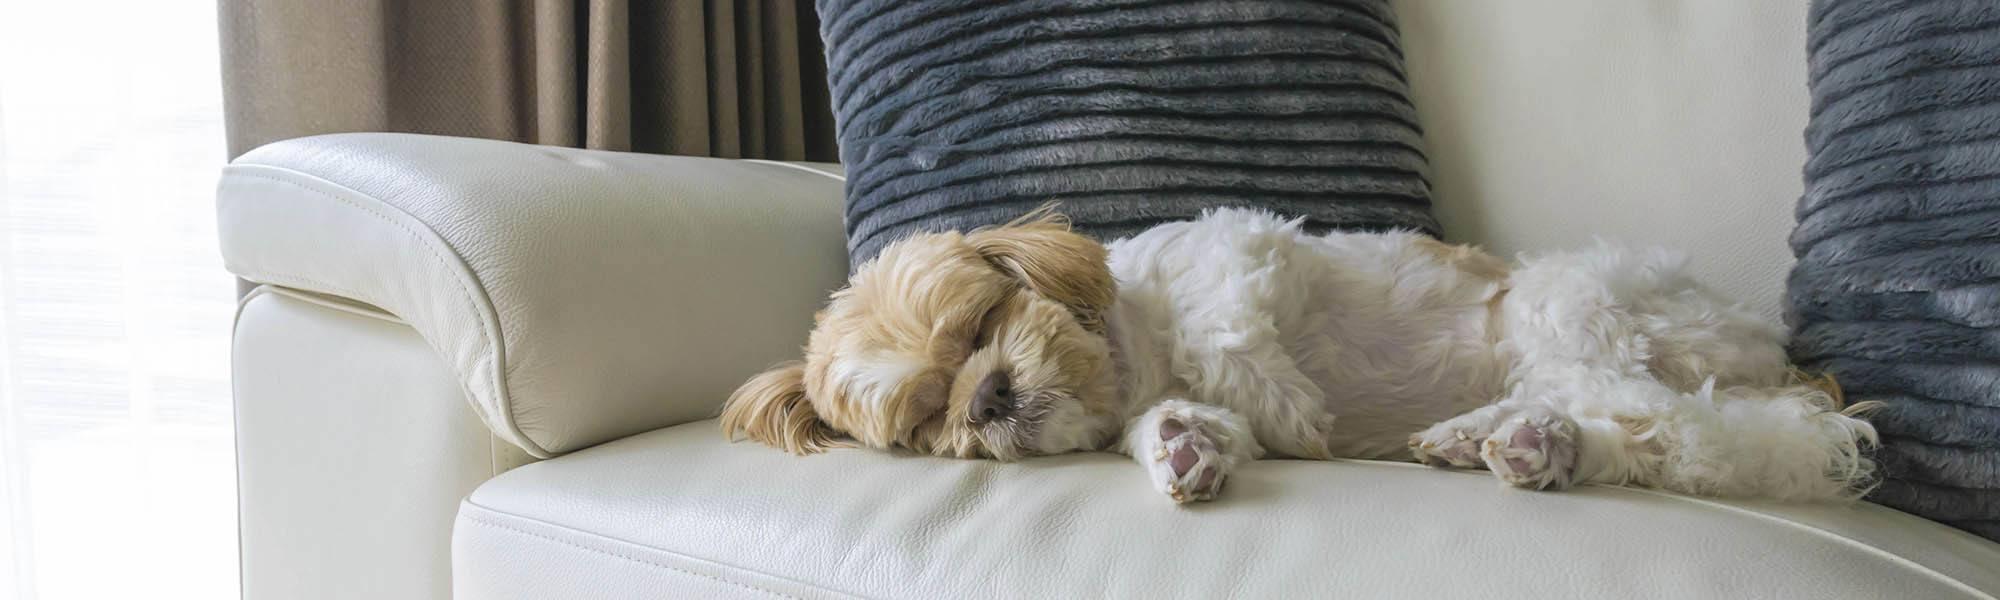 Pet friendly apartments in Atlanta